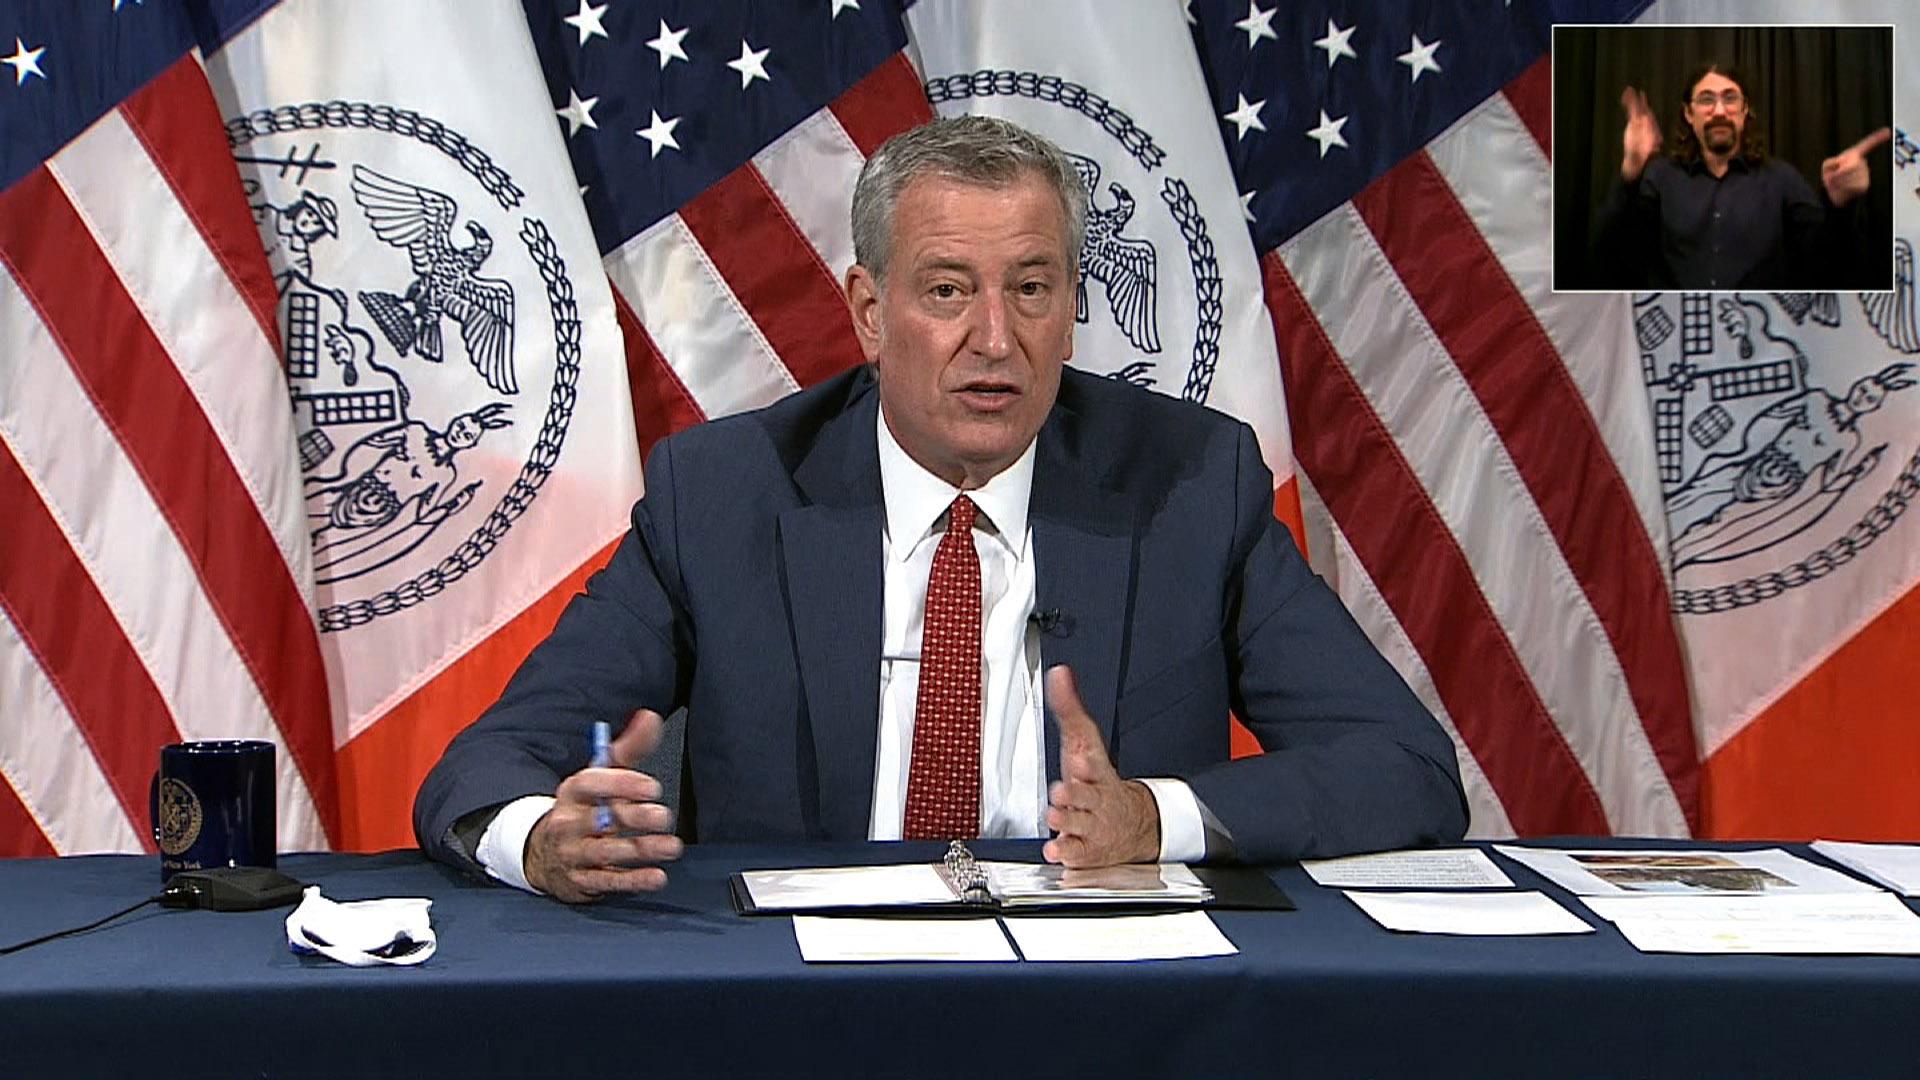 New York City Mayor Bill de Blasio speaks during a press conference in New York on November 19.